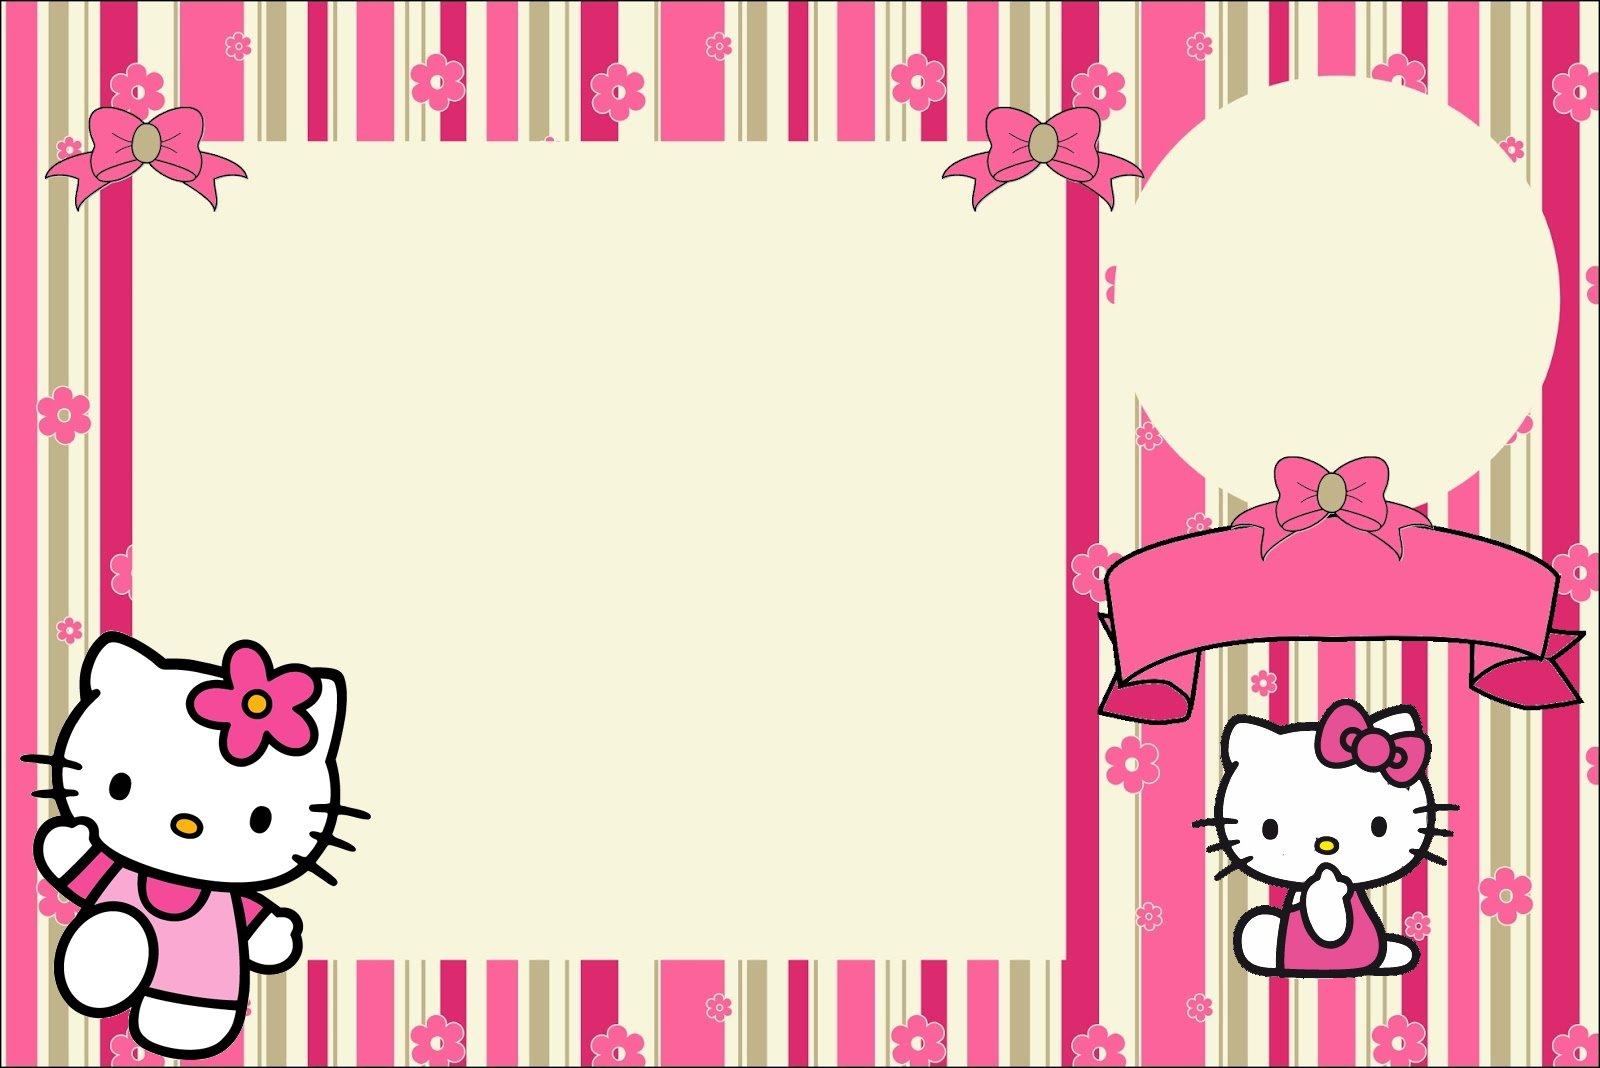 Großzügig Hallo Kitty Bilderrahmen Bilder - Rahmen Ideen ...